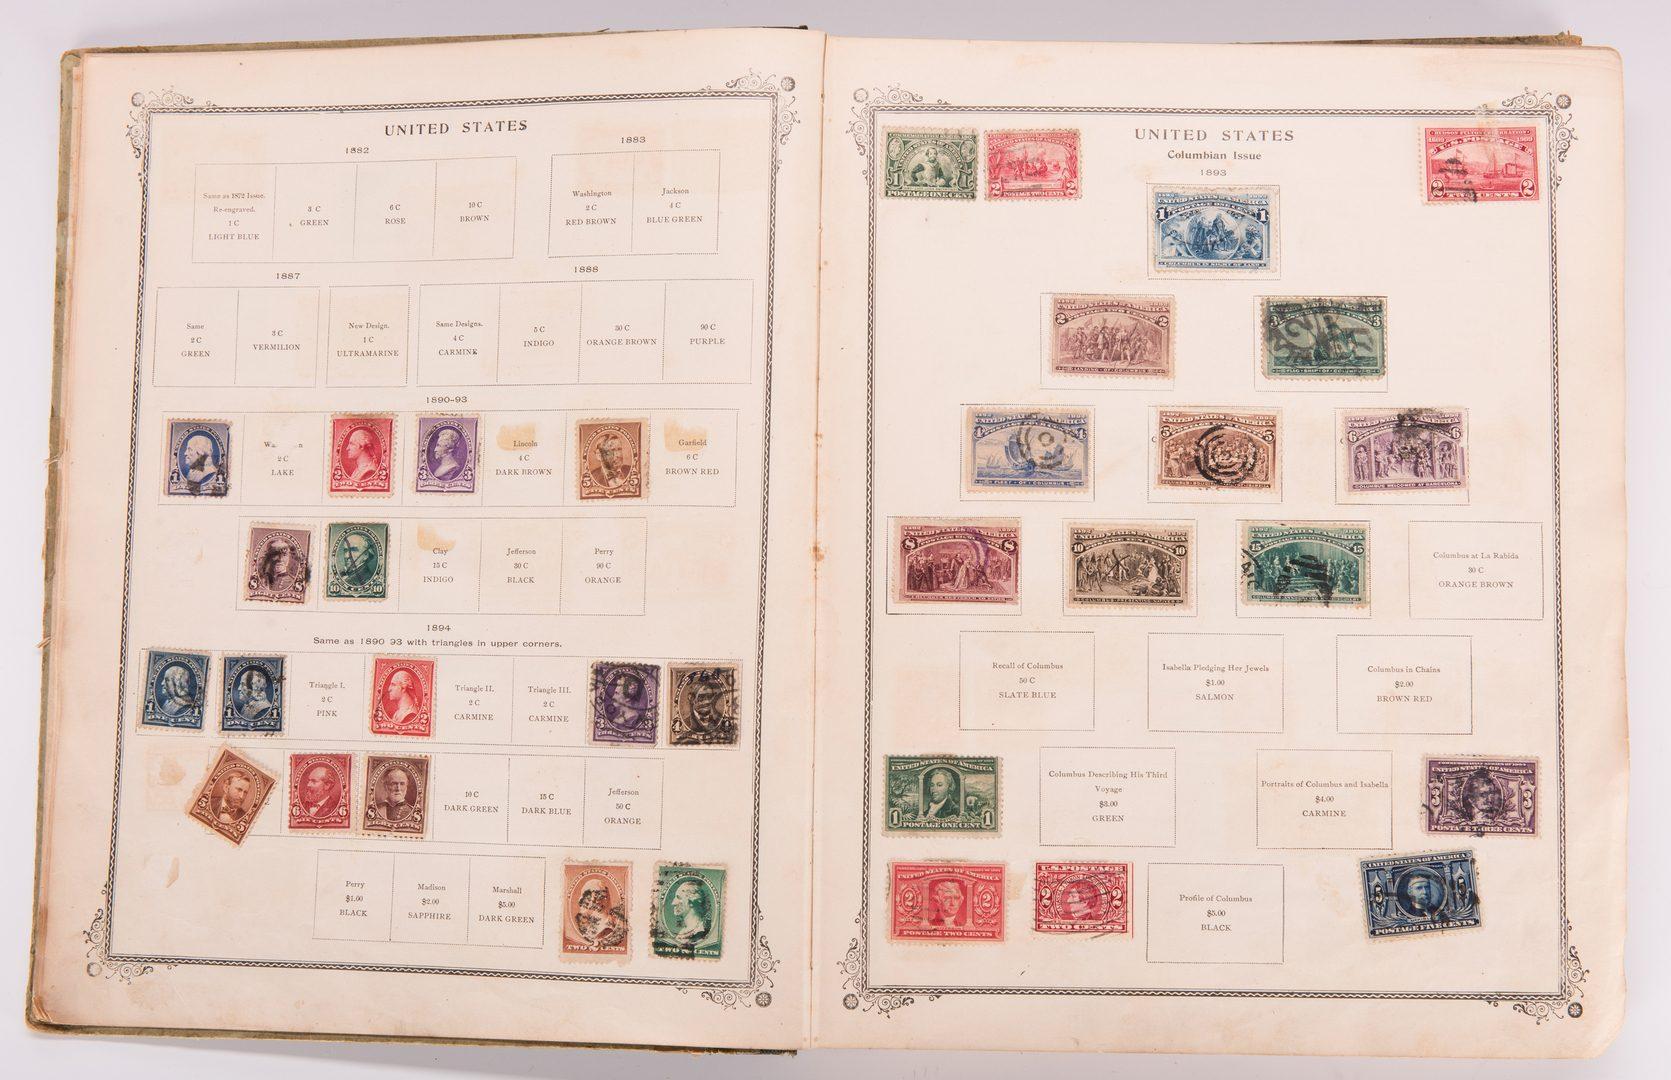 Lot 114: Scott's International Postage Stamp Album, 1902